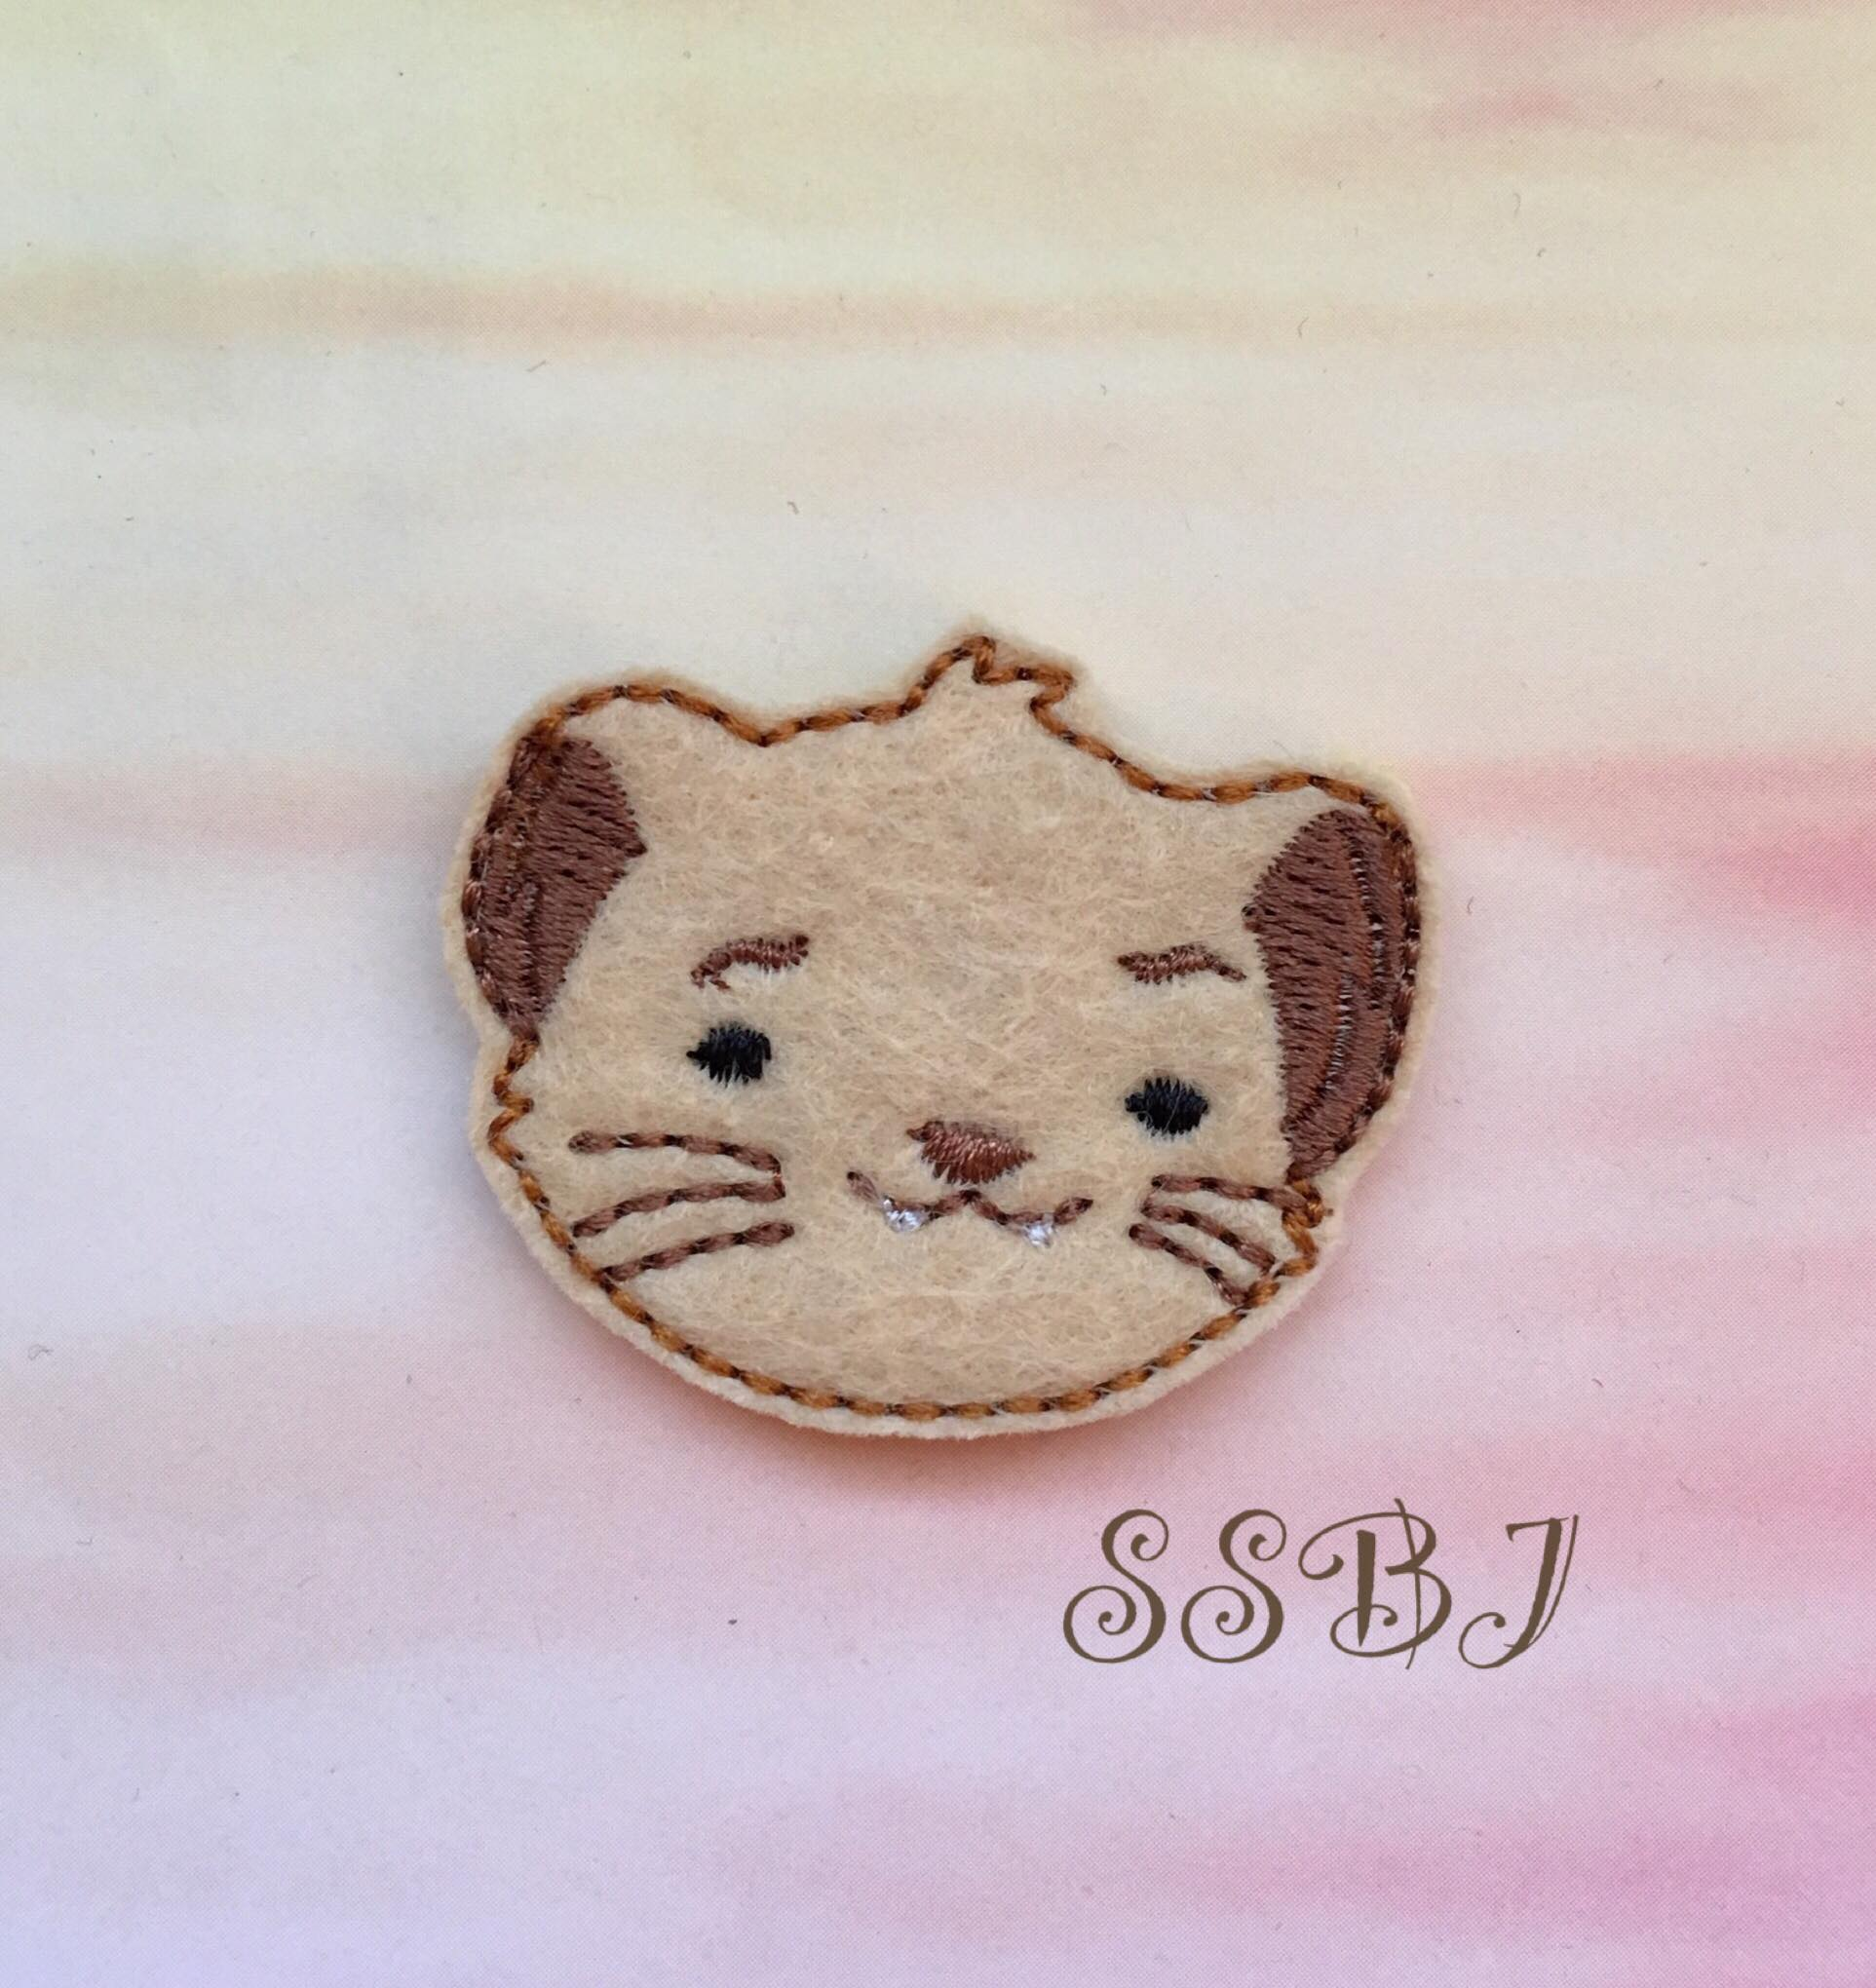 SSBJ Lion Friends Simba Embroidery File